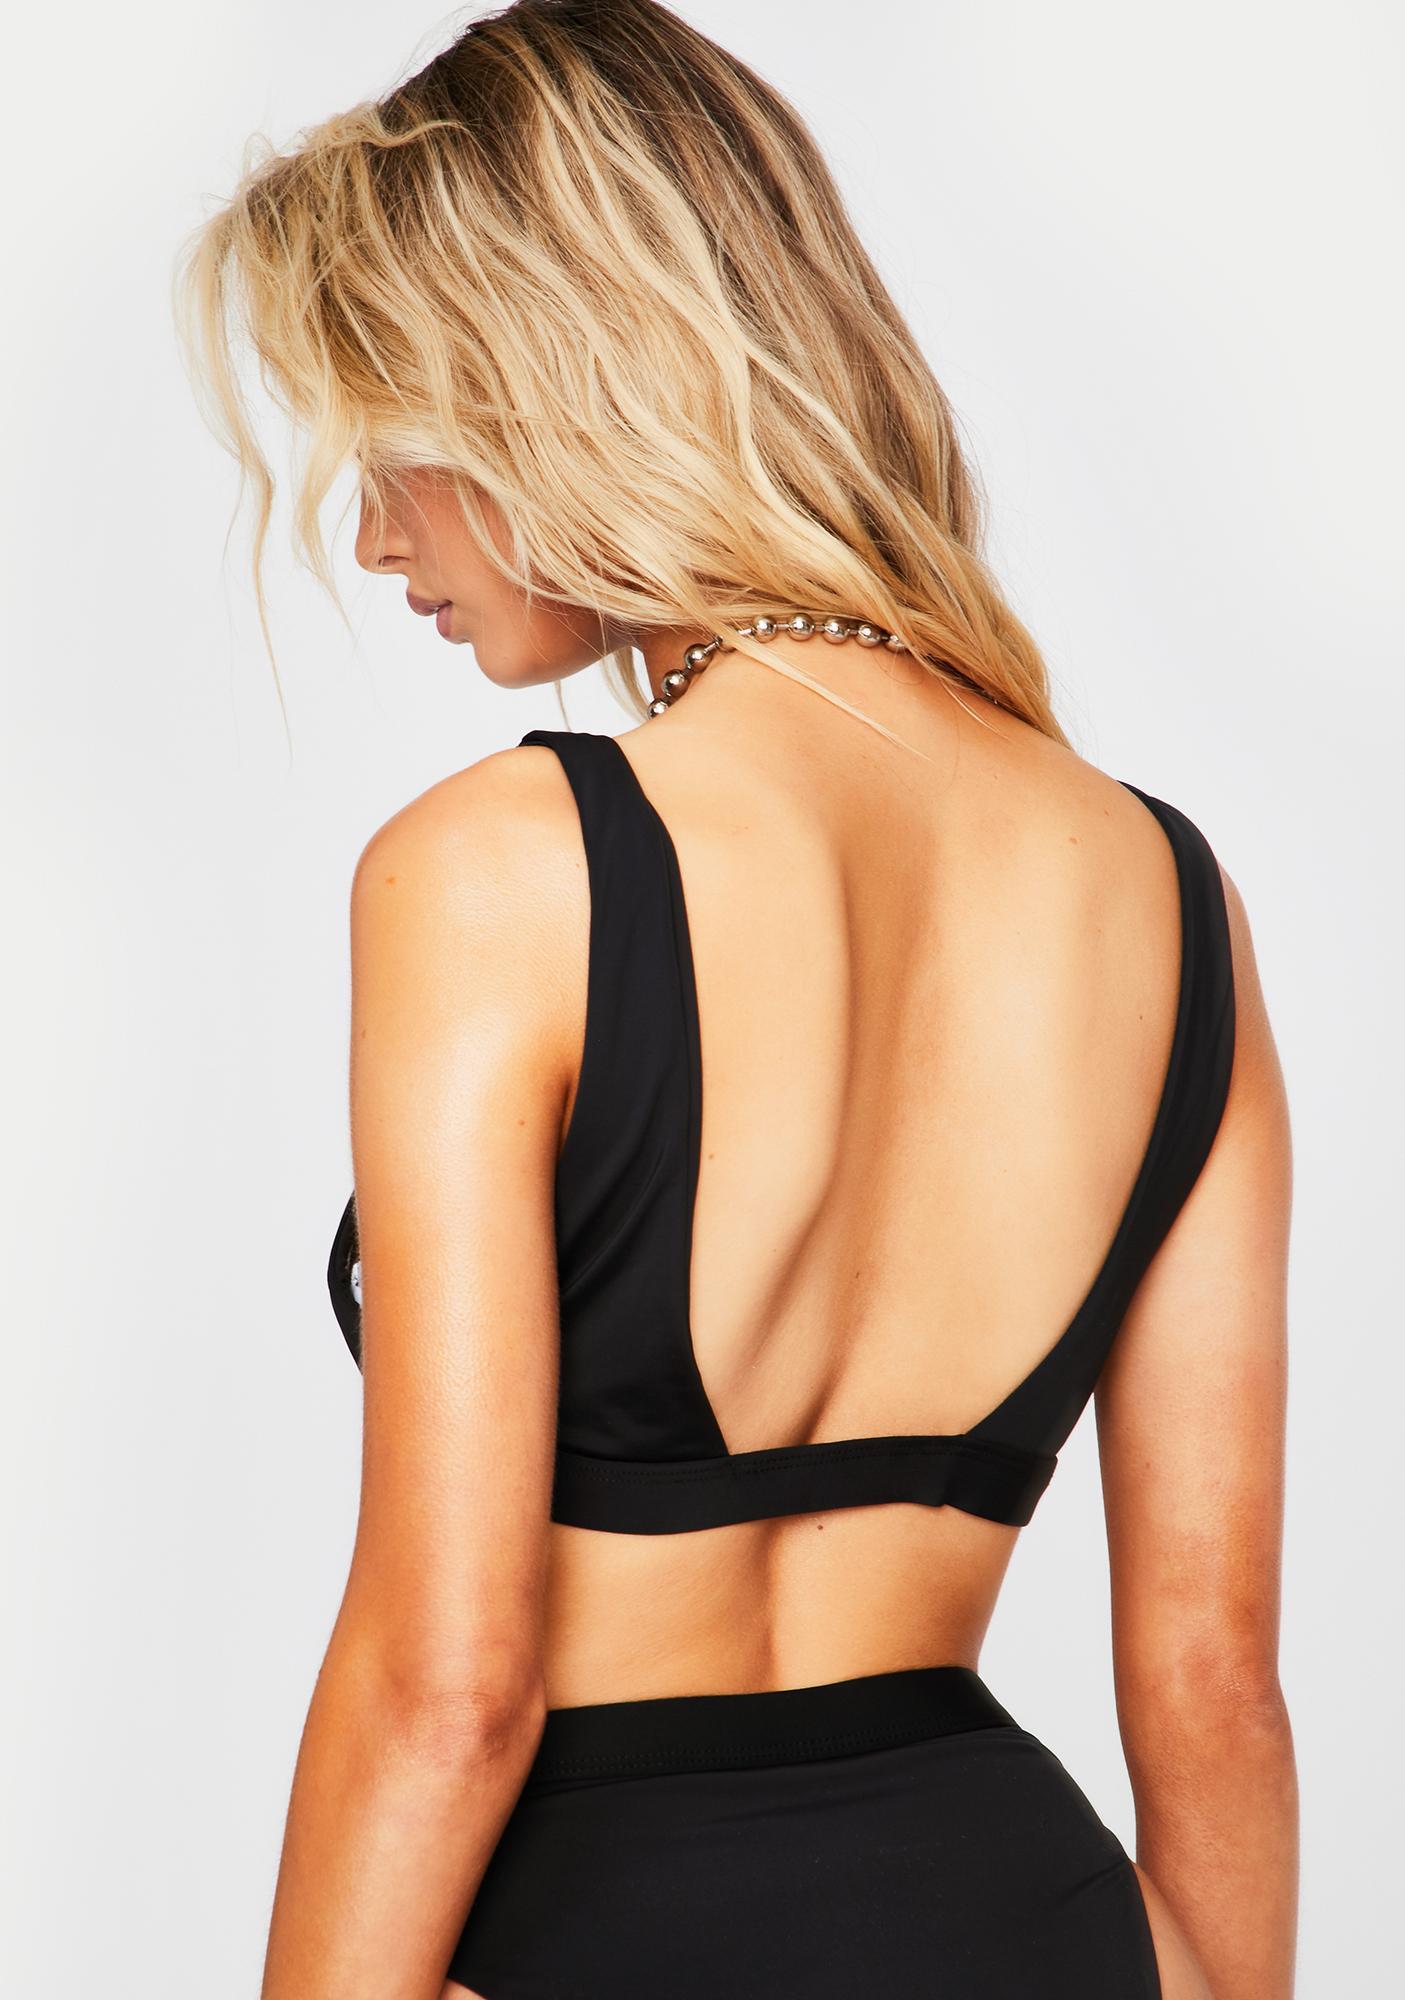 Dippin' Daisy's Black Festival Bikini Top